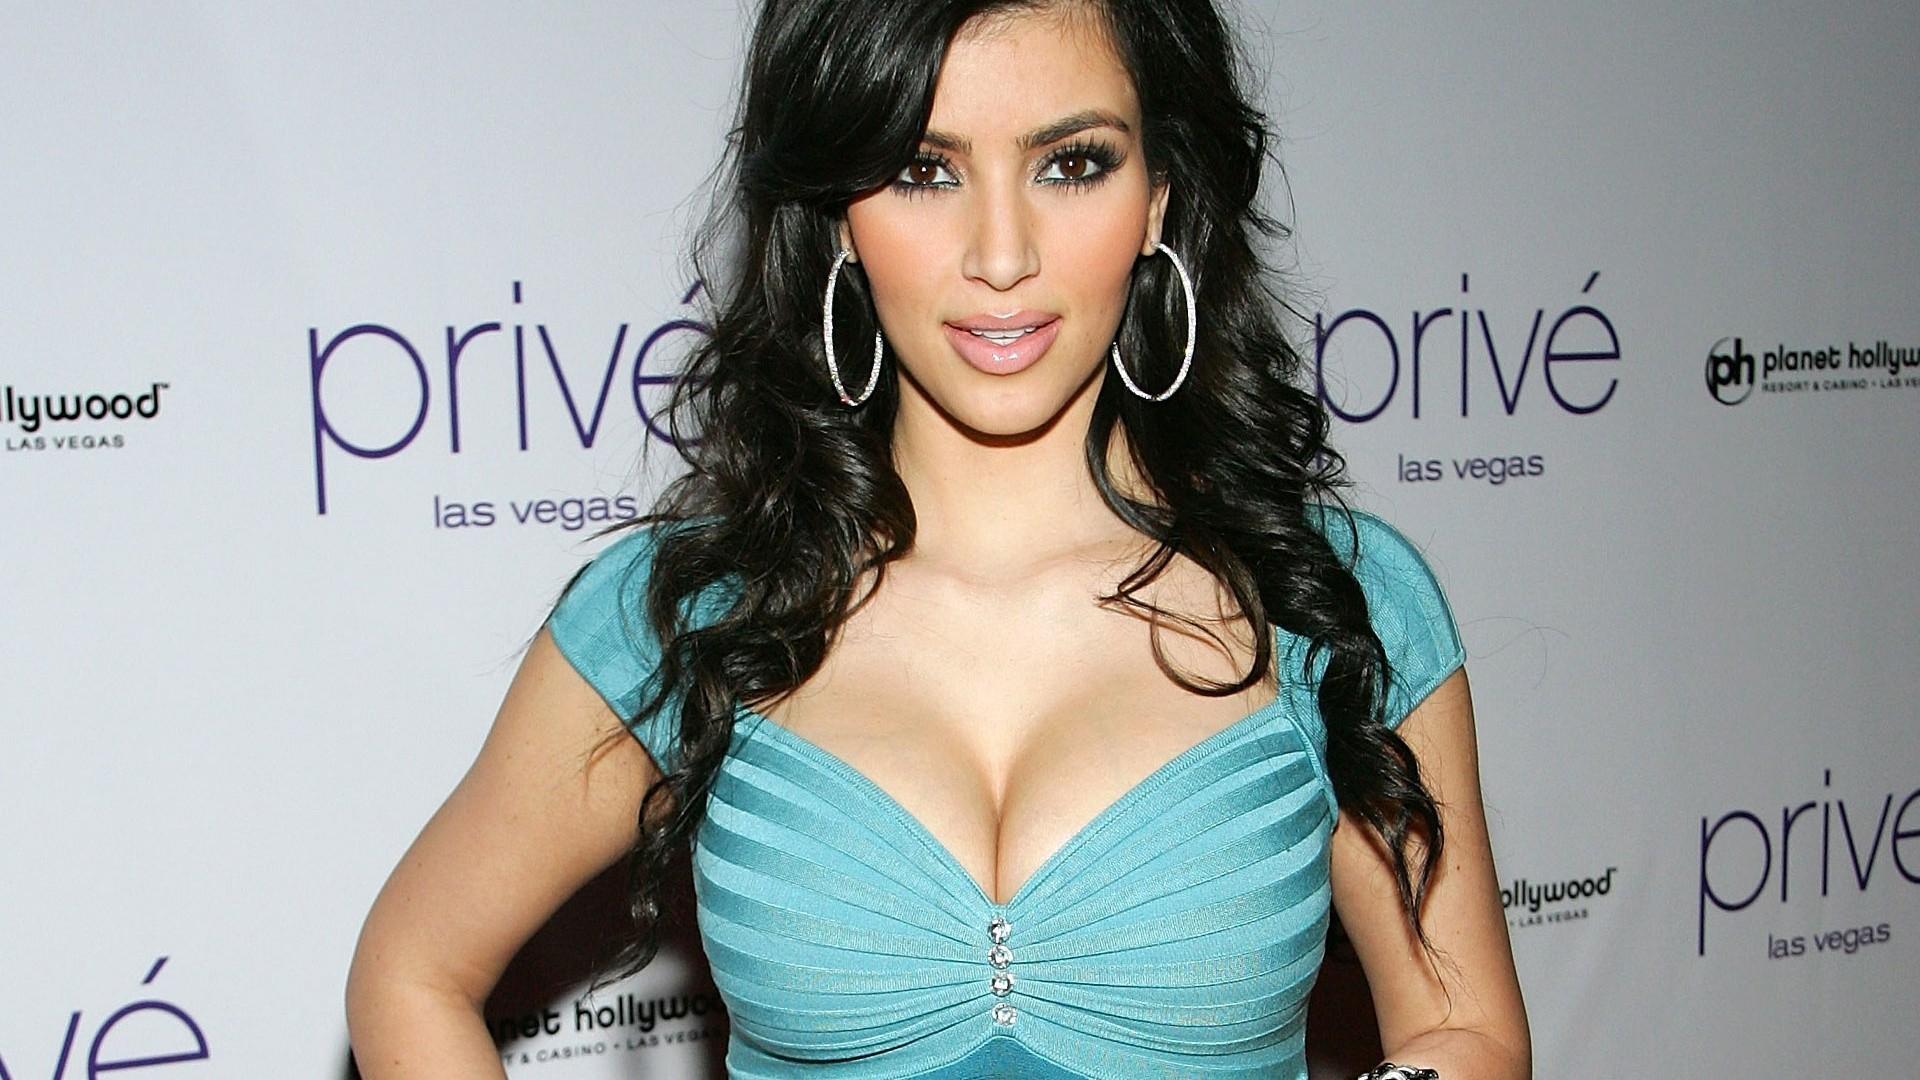 Kim Kardashian Hot Girl Hd Wallpaper Kim Kardashian 737103